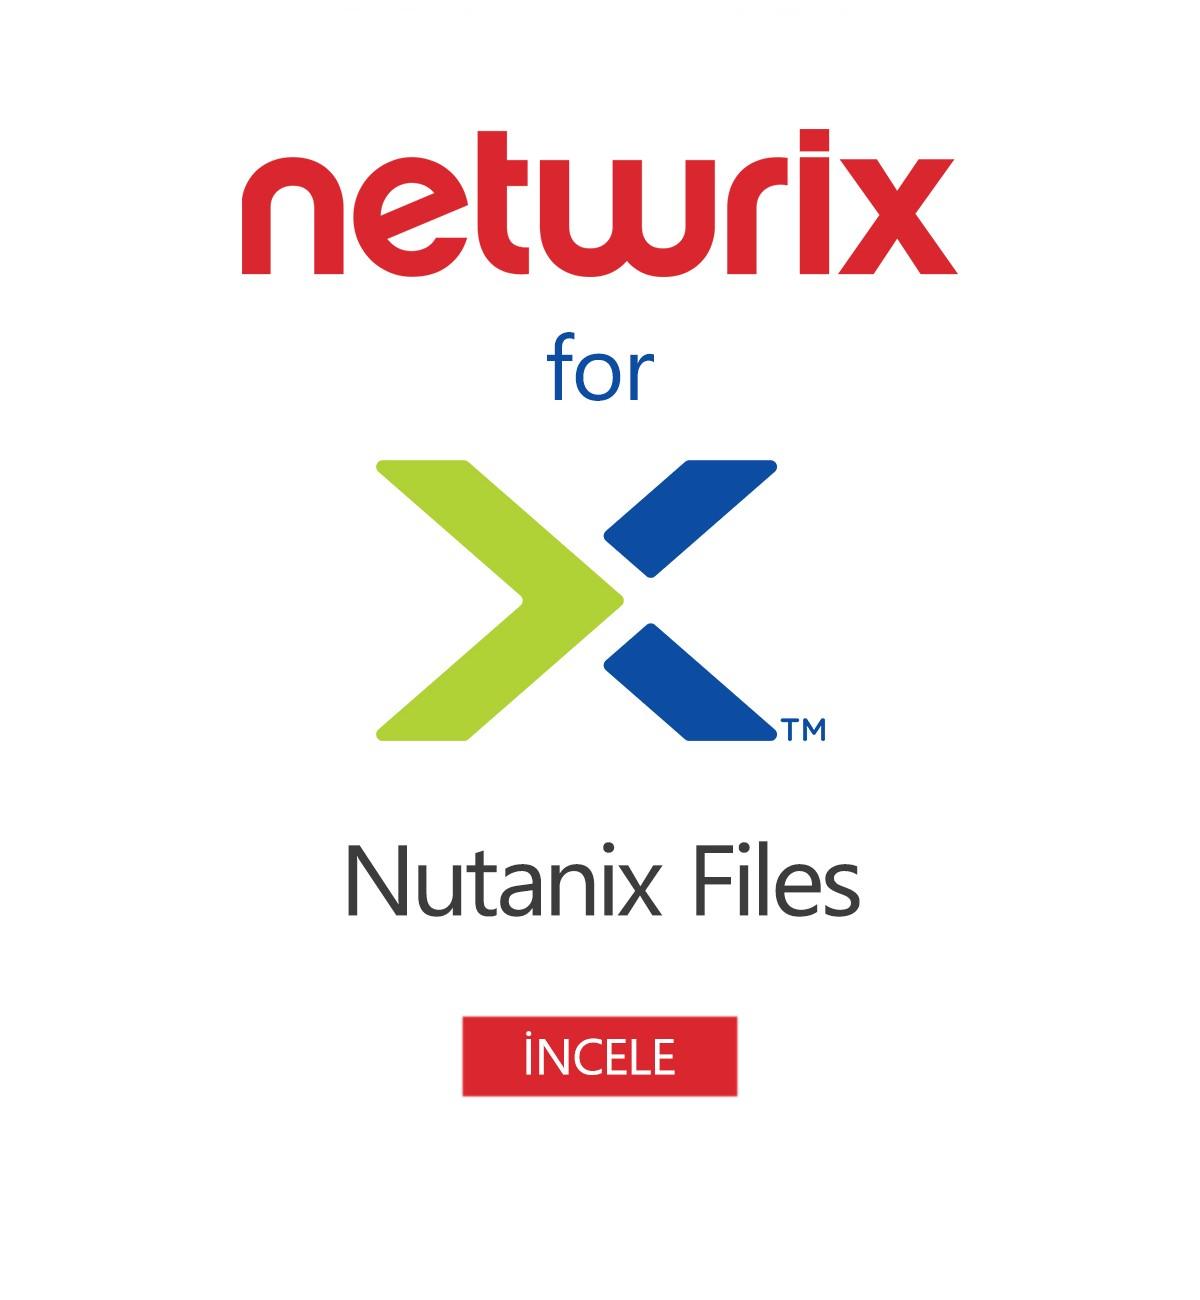 Netwrix Auditor for Nutanix Files